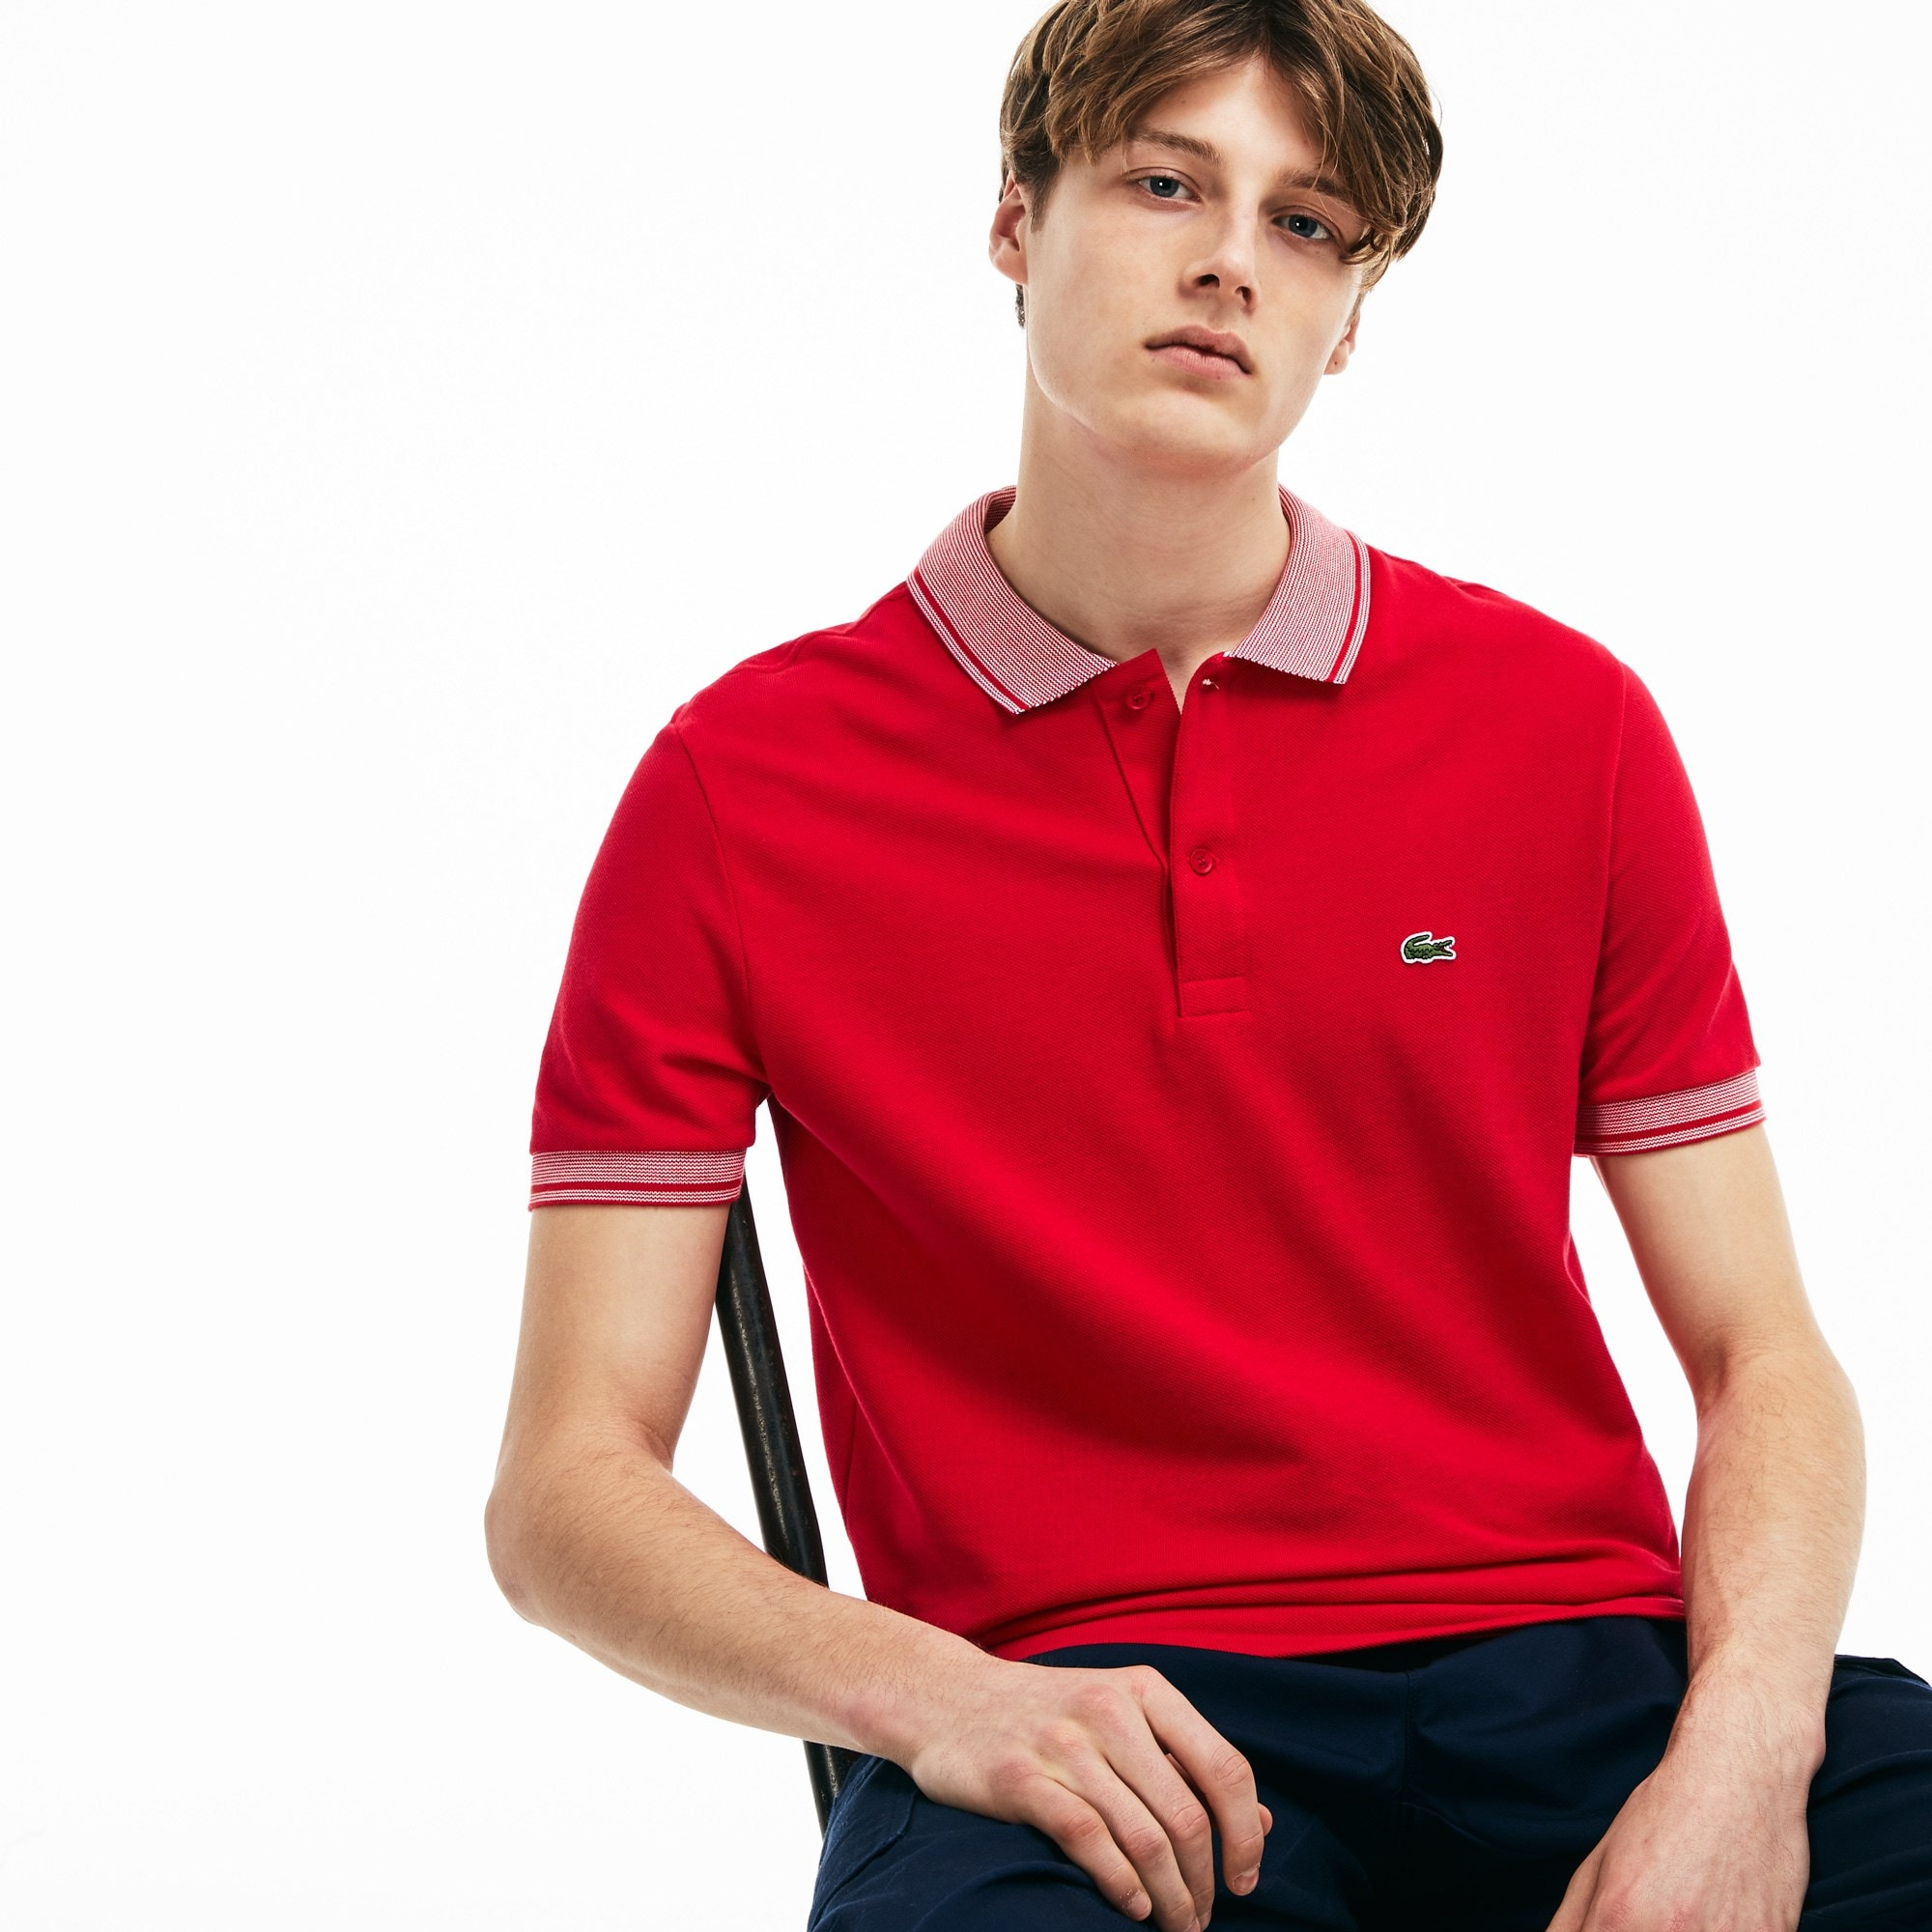 b3b0900f3e199 Men s Lacoste Regular Fit Piped Cotton Petit Piqué Polo Shirt